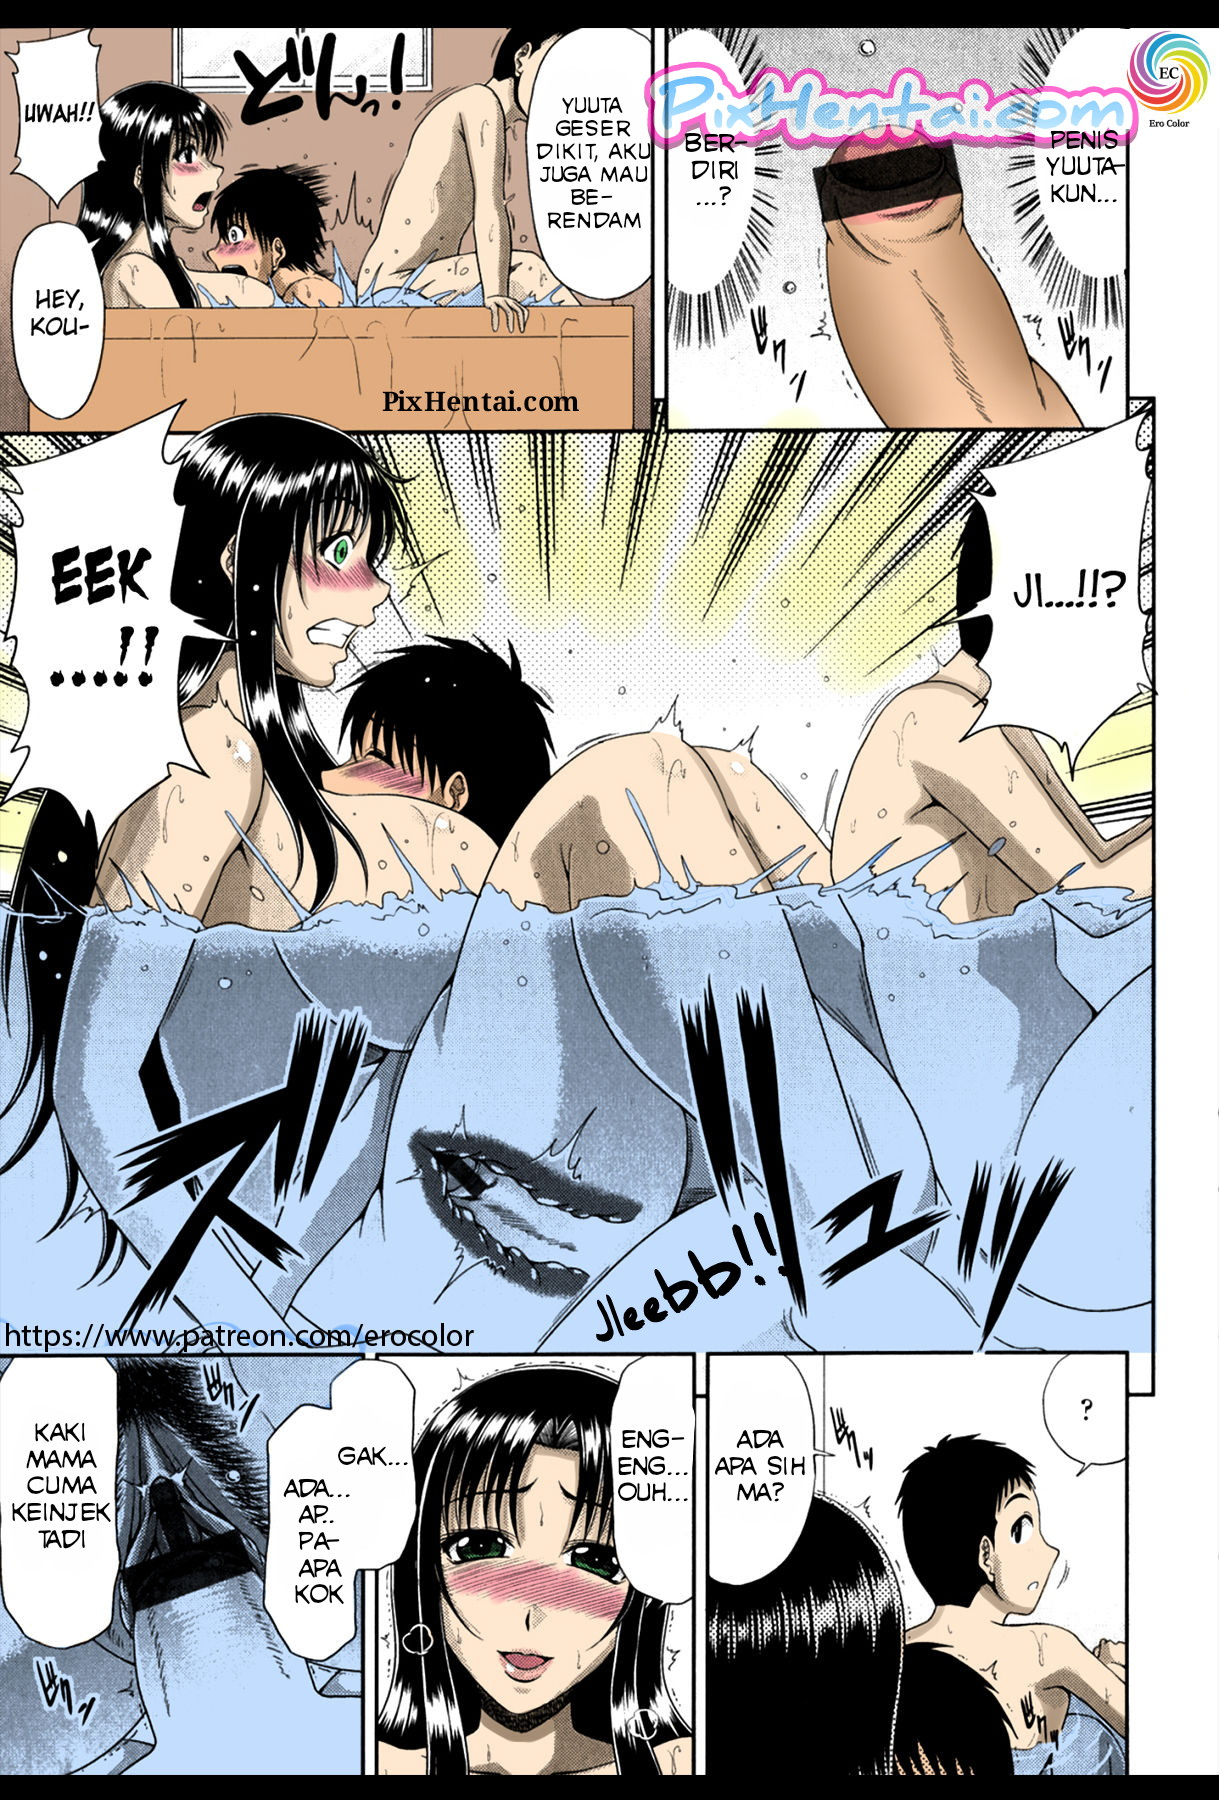 Komik Hentai Mandi dengan Ibunya Teman yang Bohai Manga Sex Porn Doujin XXX Bokep 04